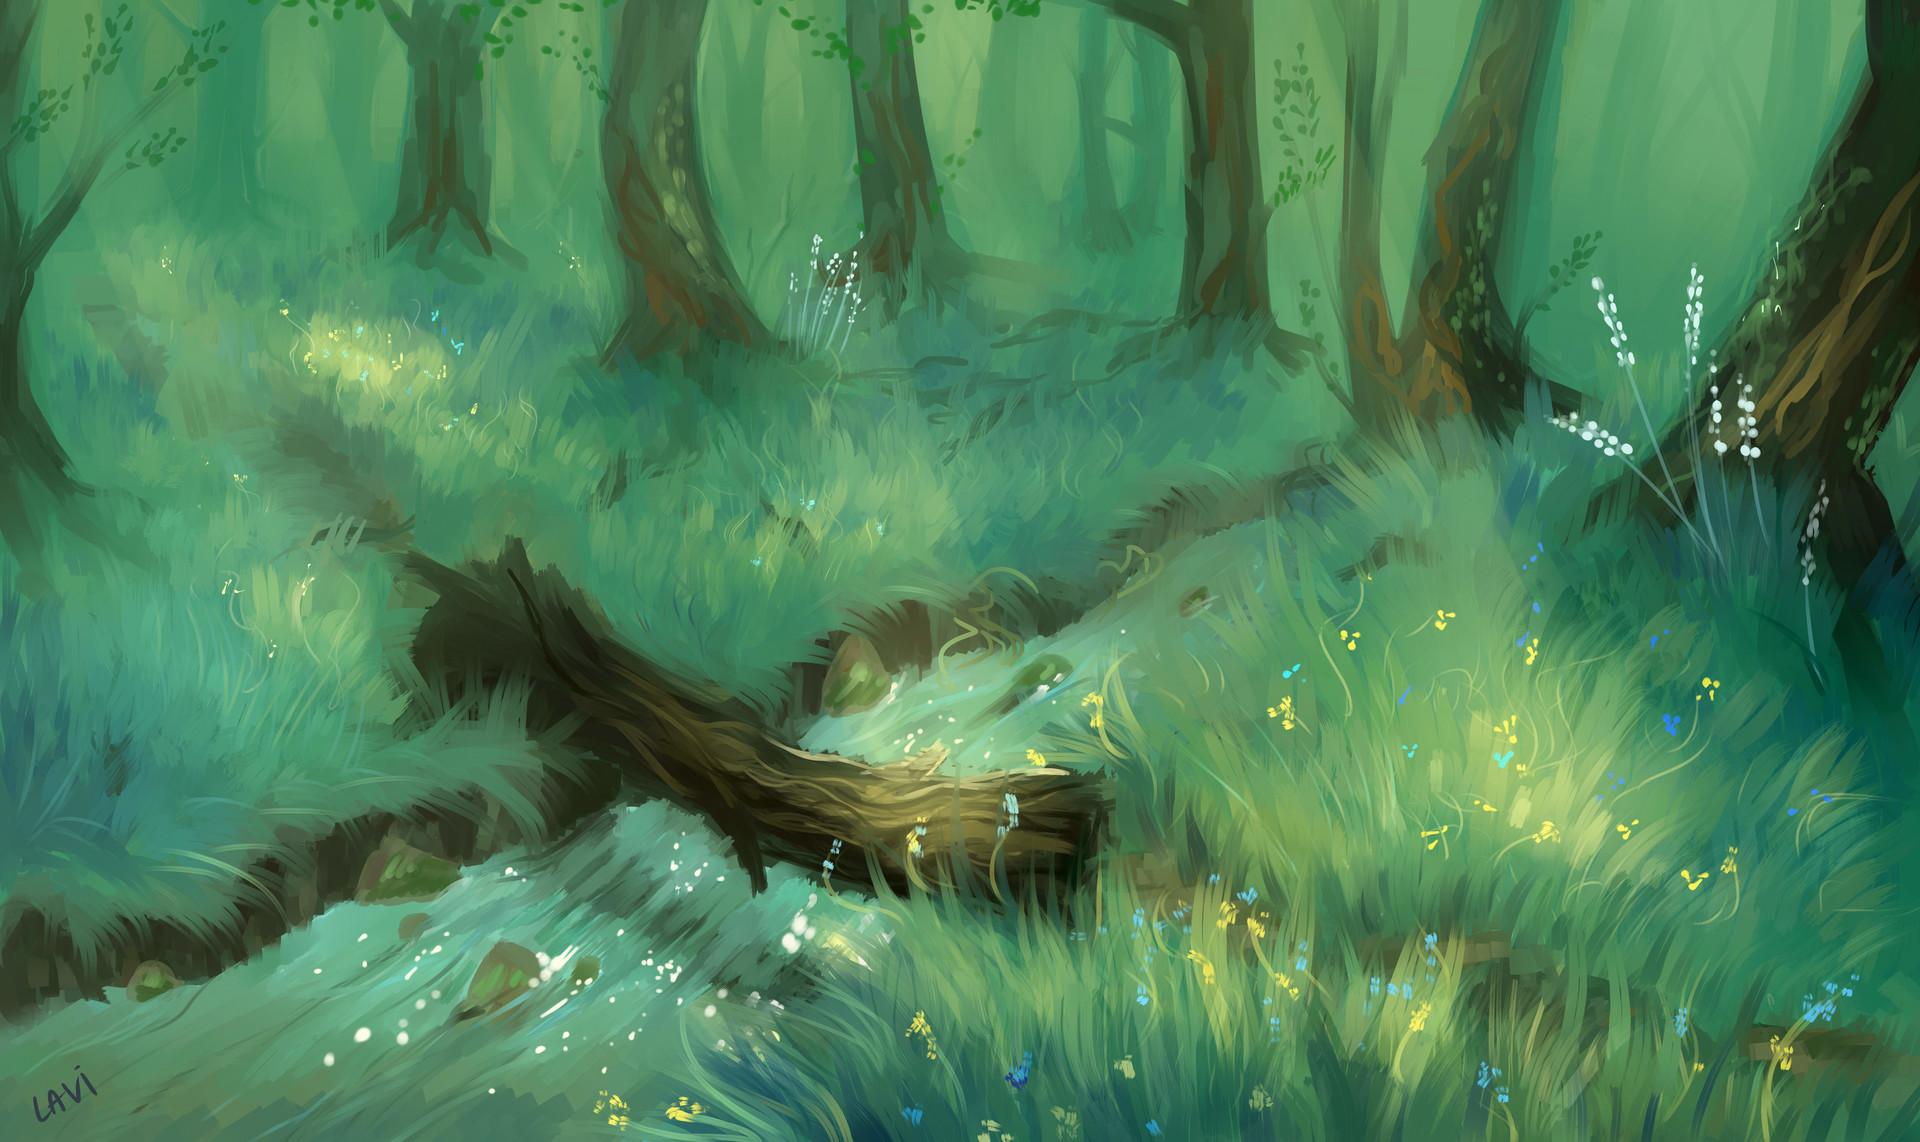 Meitar lavi forest1